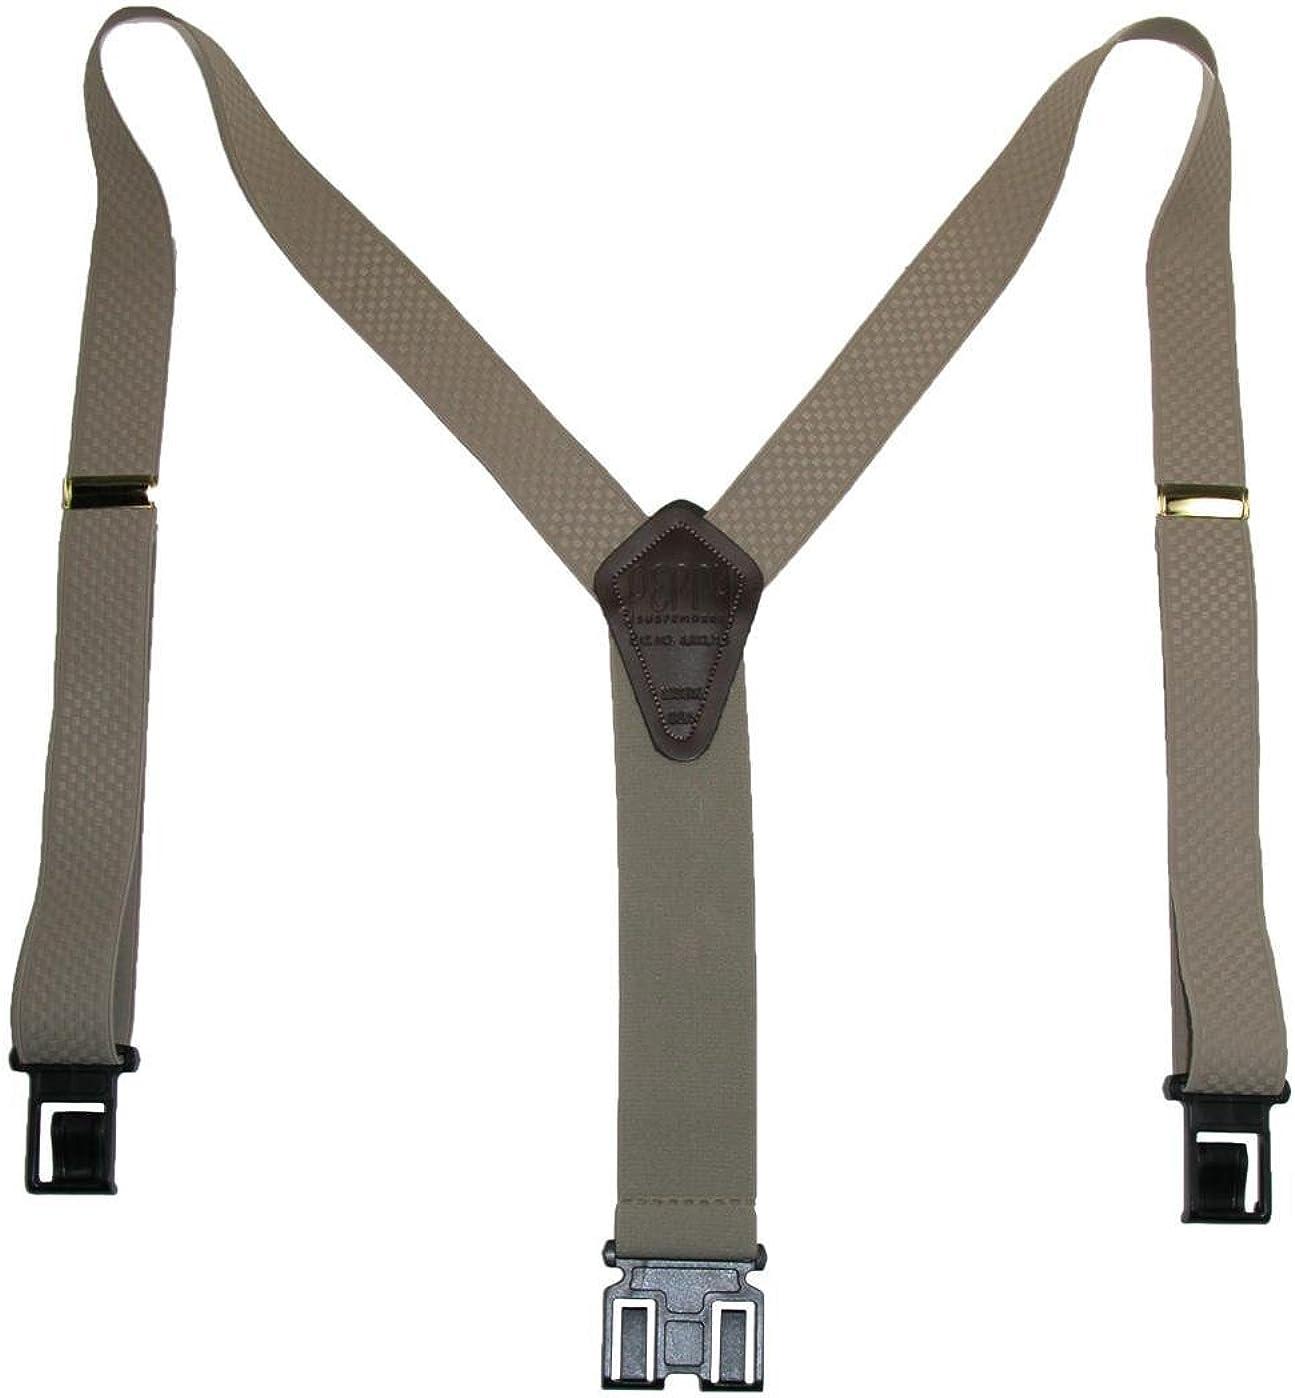 New Perry Suspenders Men/'s Leather Dress Hook End Suspenders